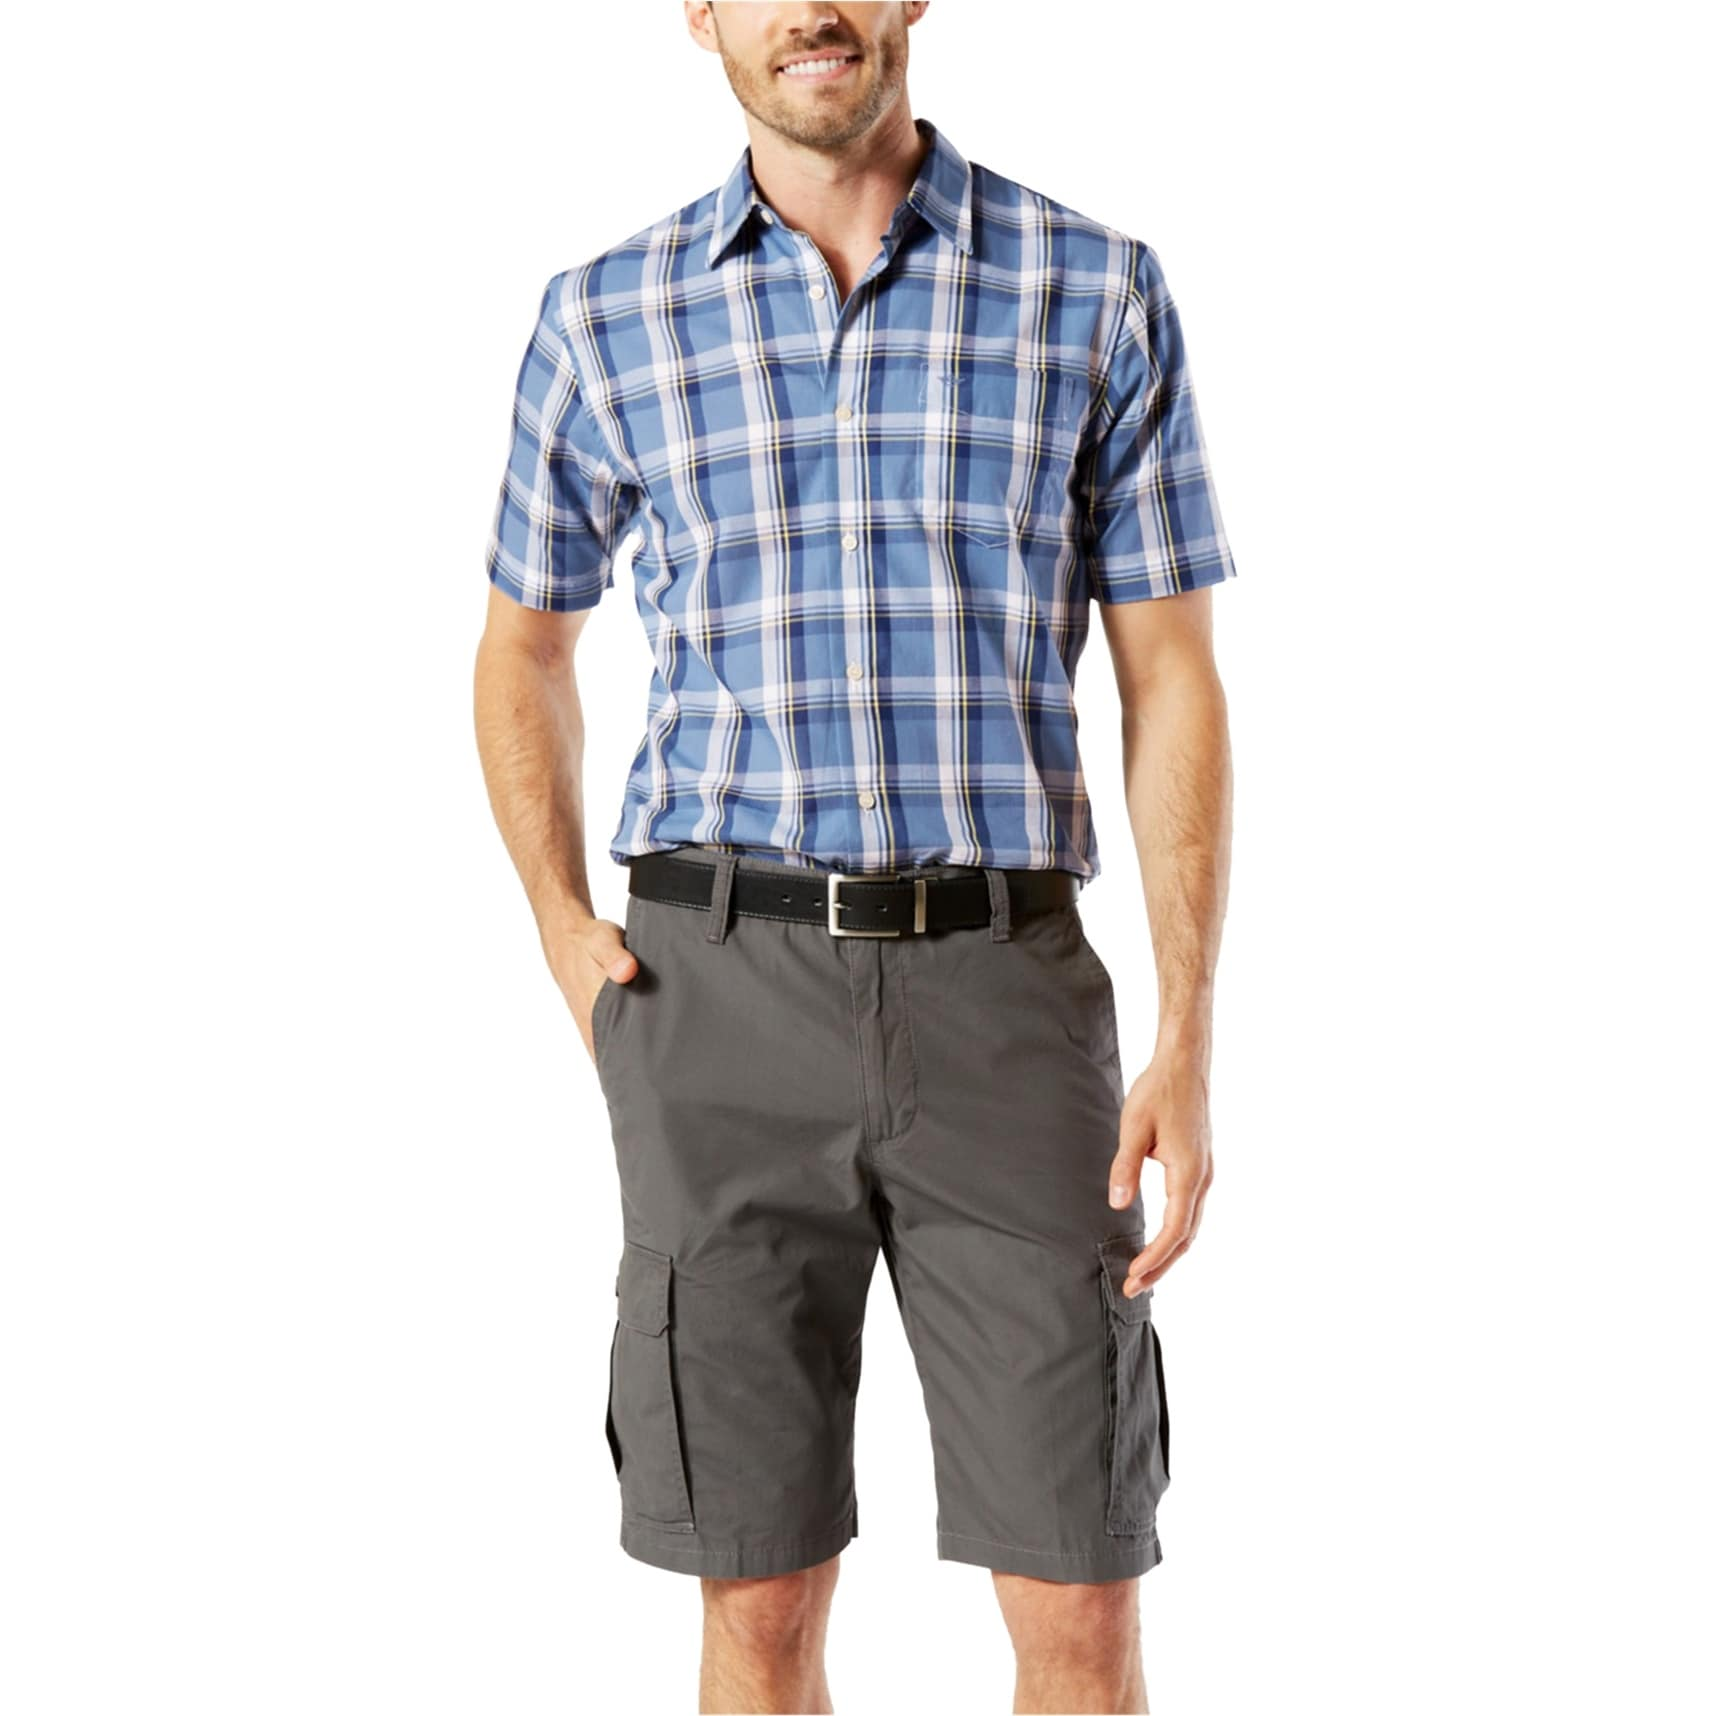 Dockers Mens Twill Casual Cargo Shorts